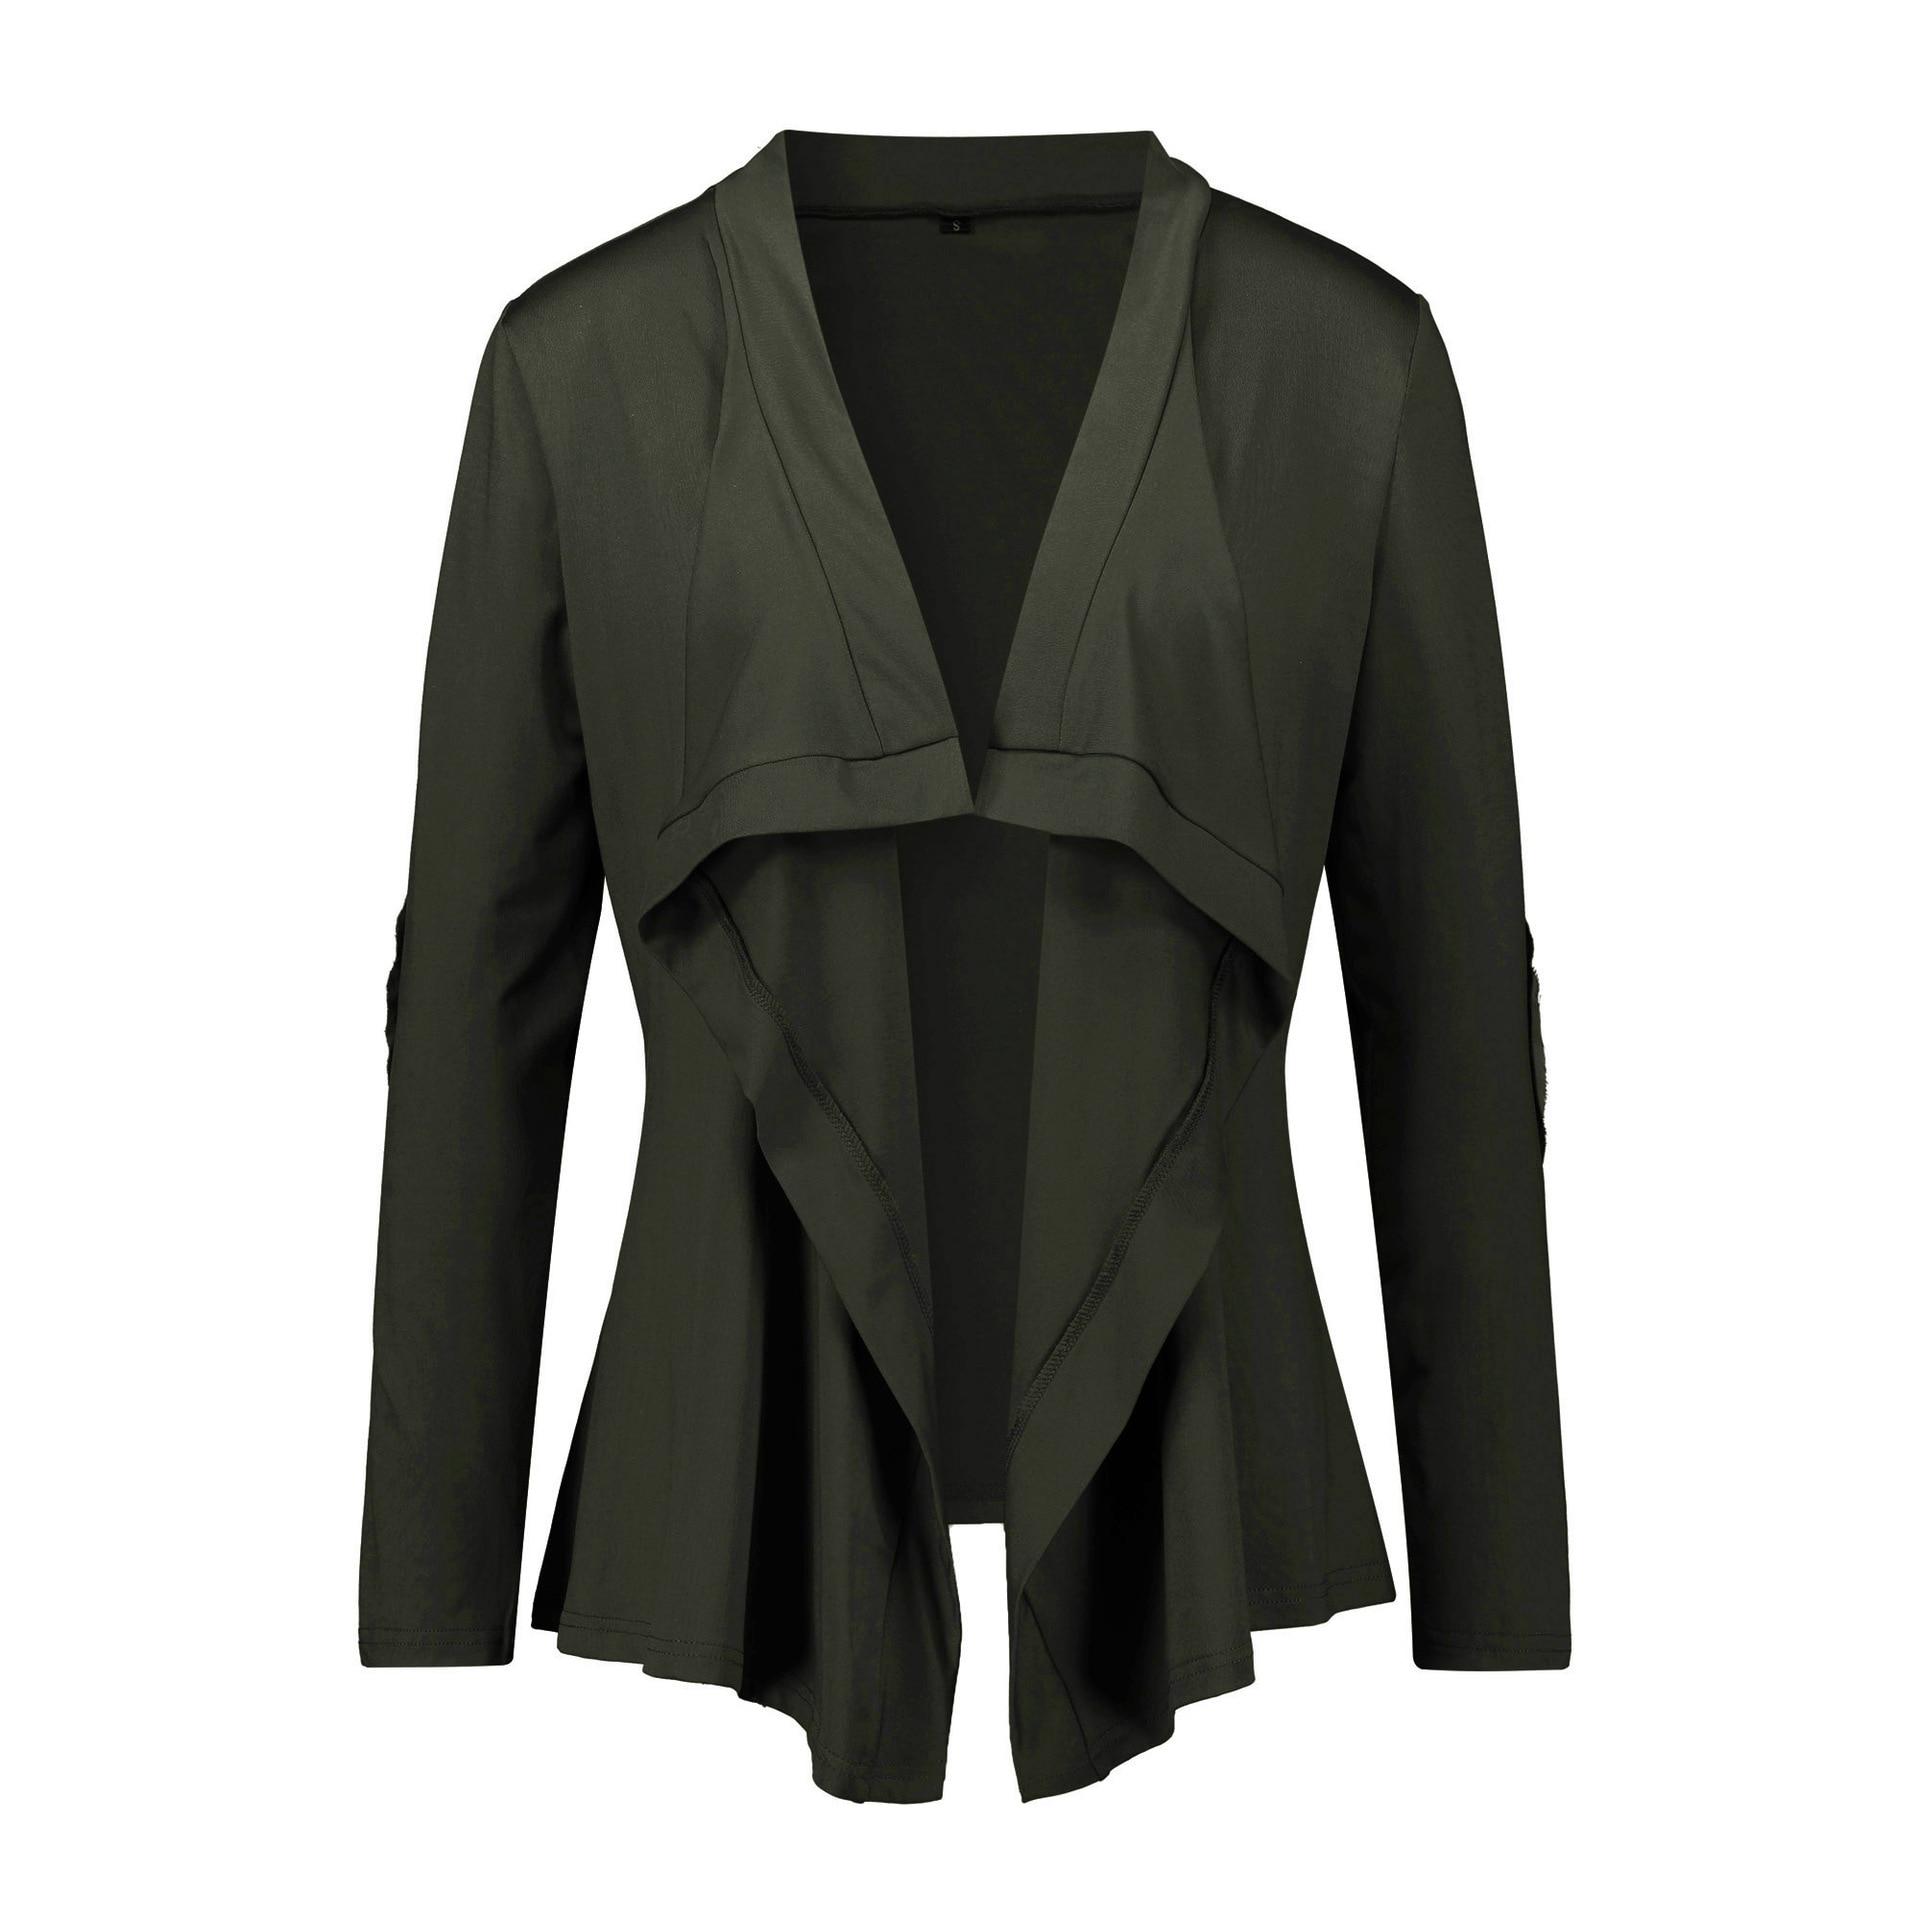 Women's Coat Irregular Solid Long Sleeve Cardigan Loose Casual Autumn   Basic     Jackets   WS4965U